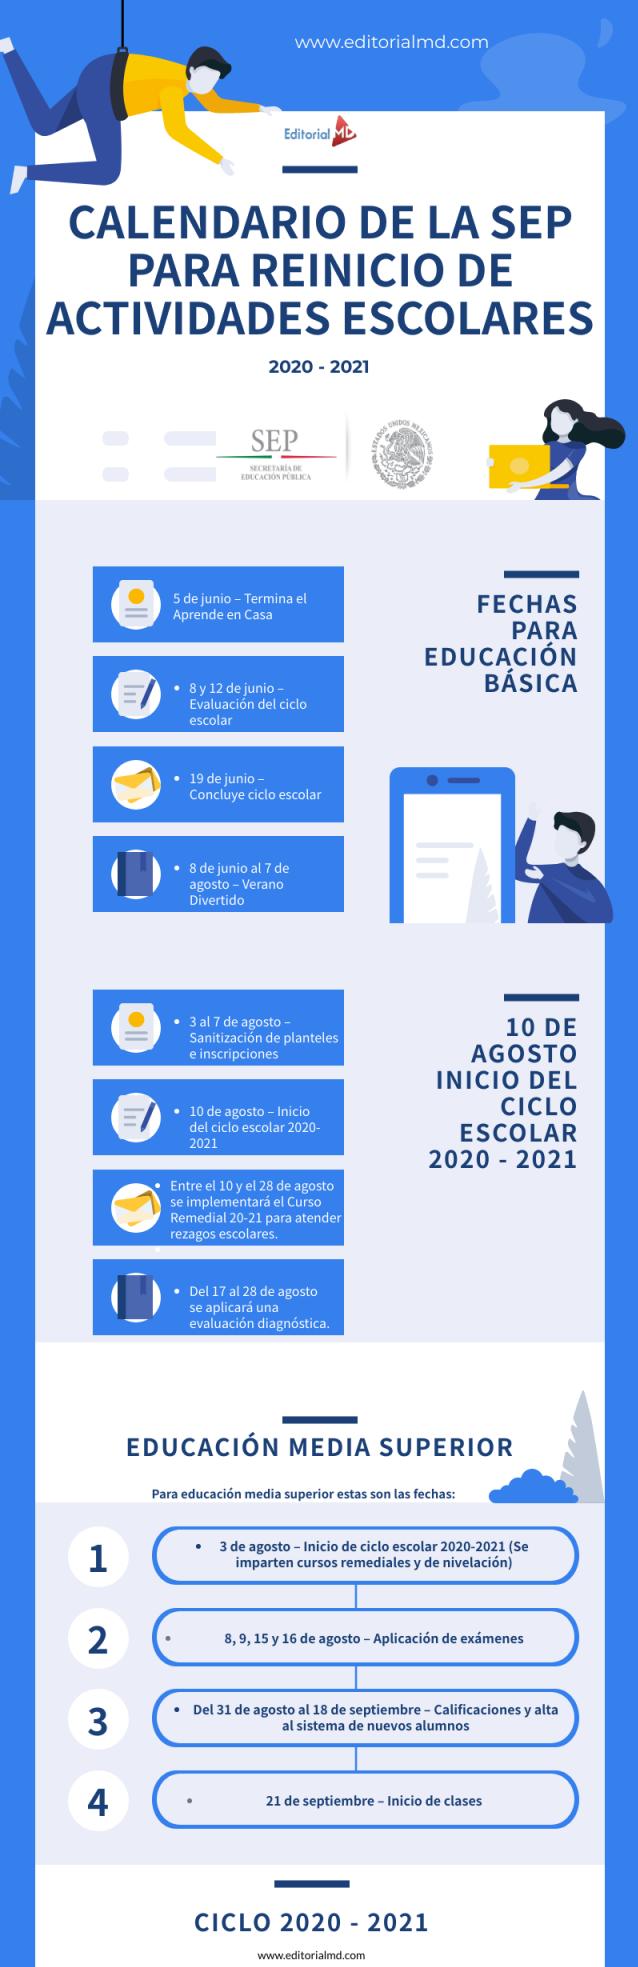 Calendario de la SEP para reinicio de actividades escolares 2020-2021